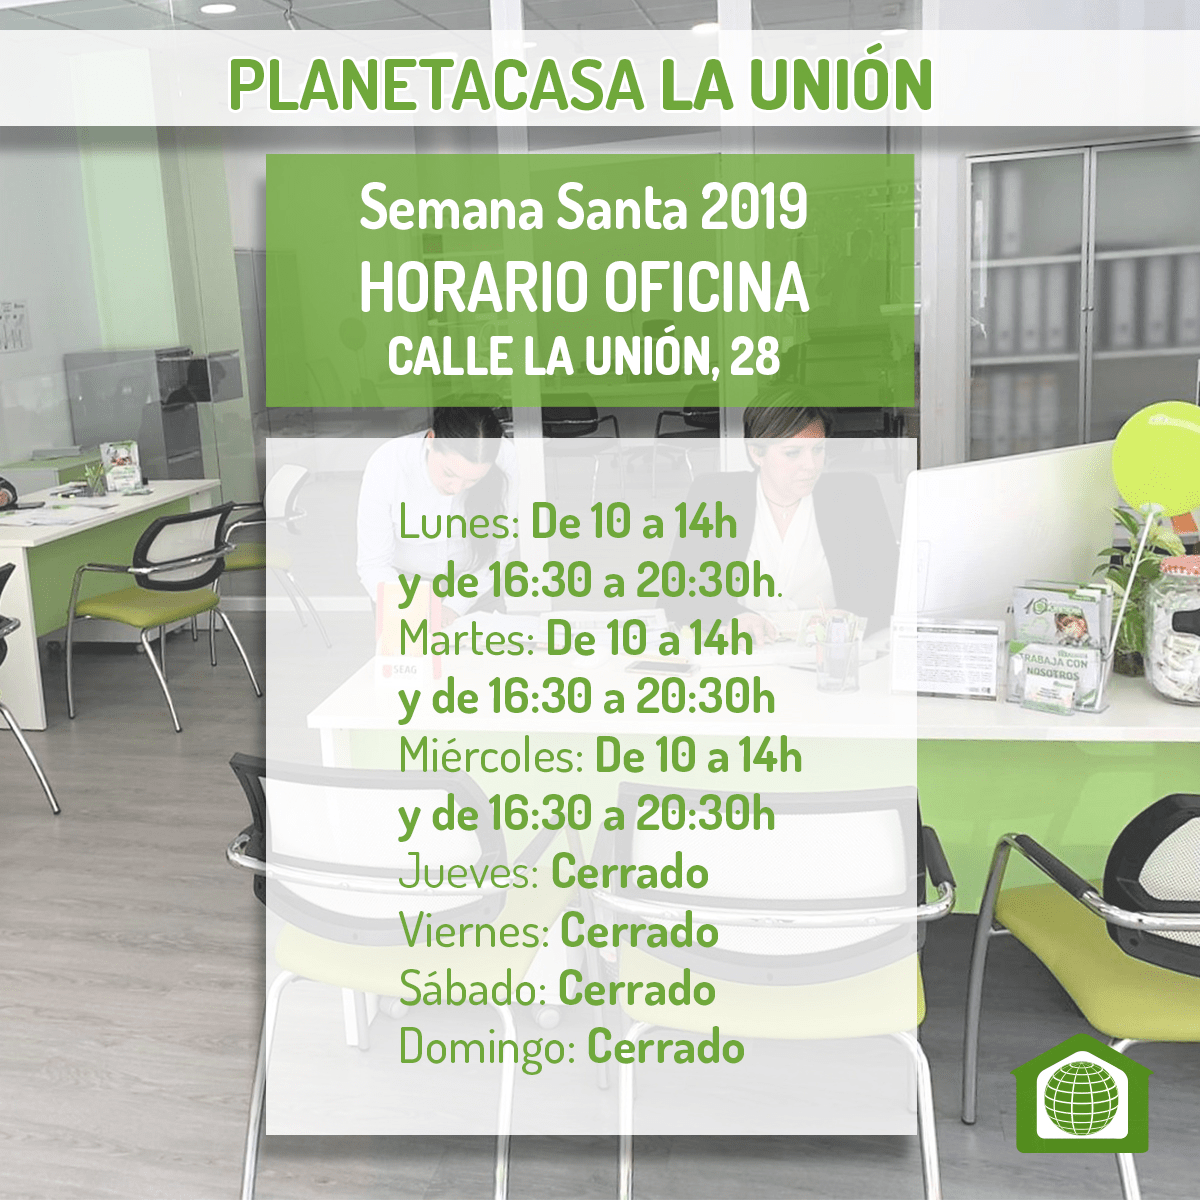 Horario oficina planetacasa La Union Semana Santa 2019